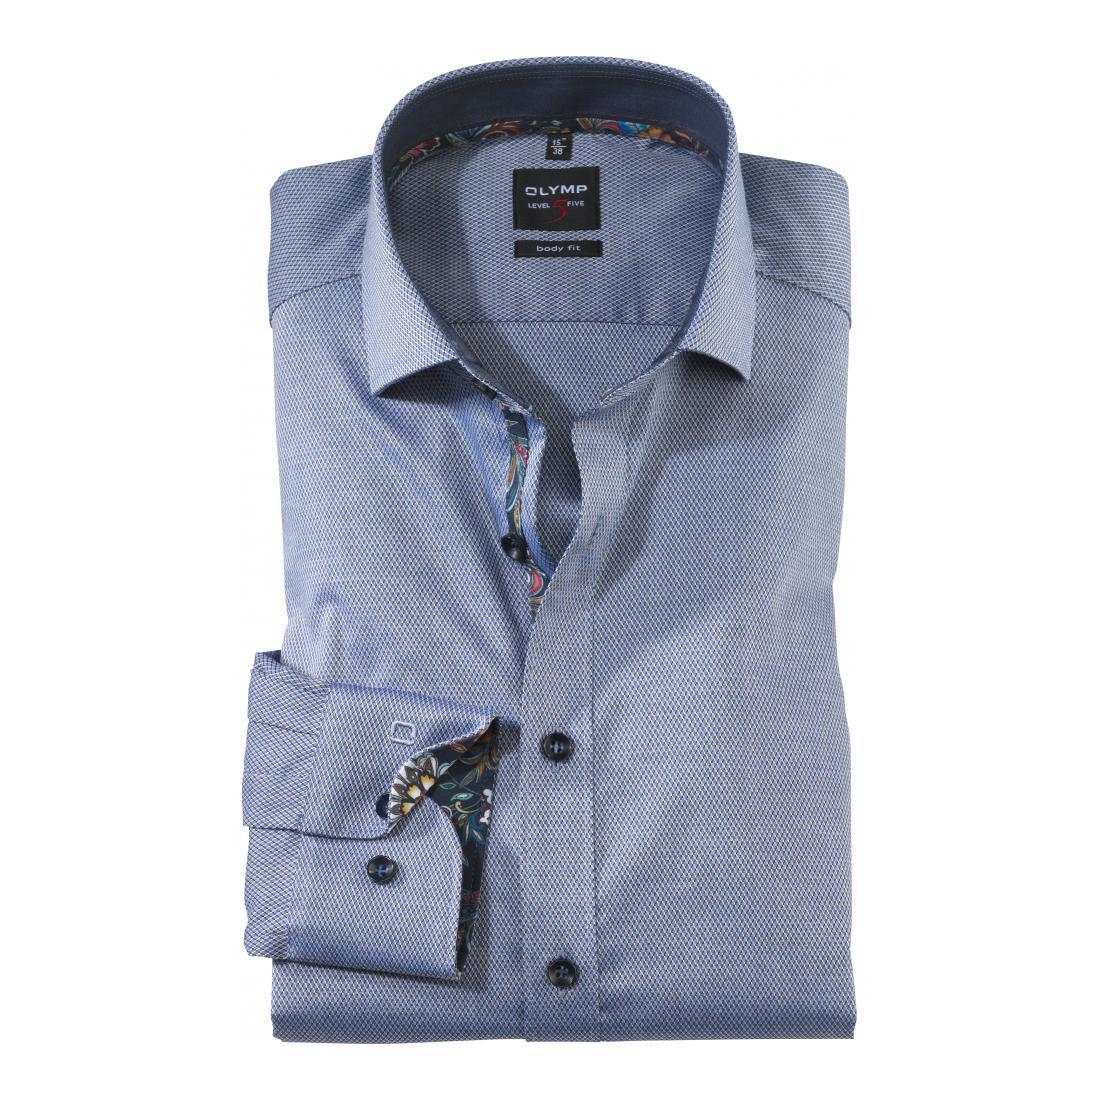 Olymp Business Hemden Herren 2028/64 Hemden